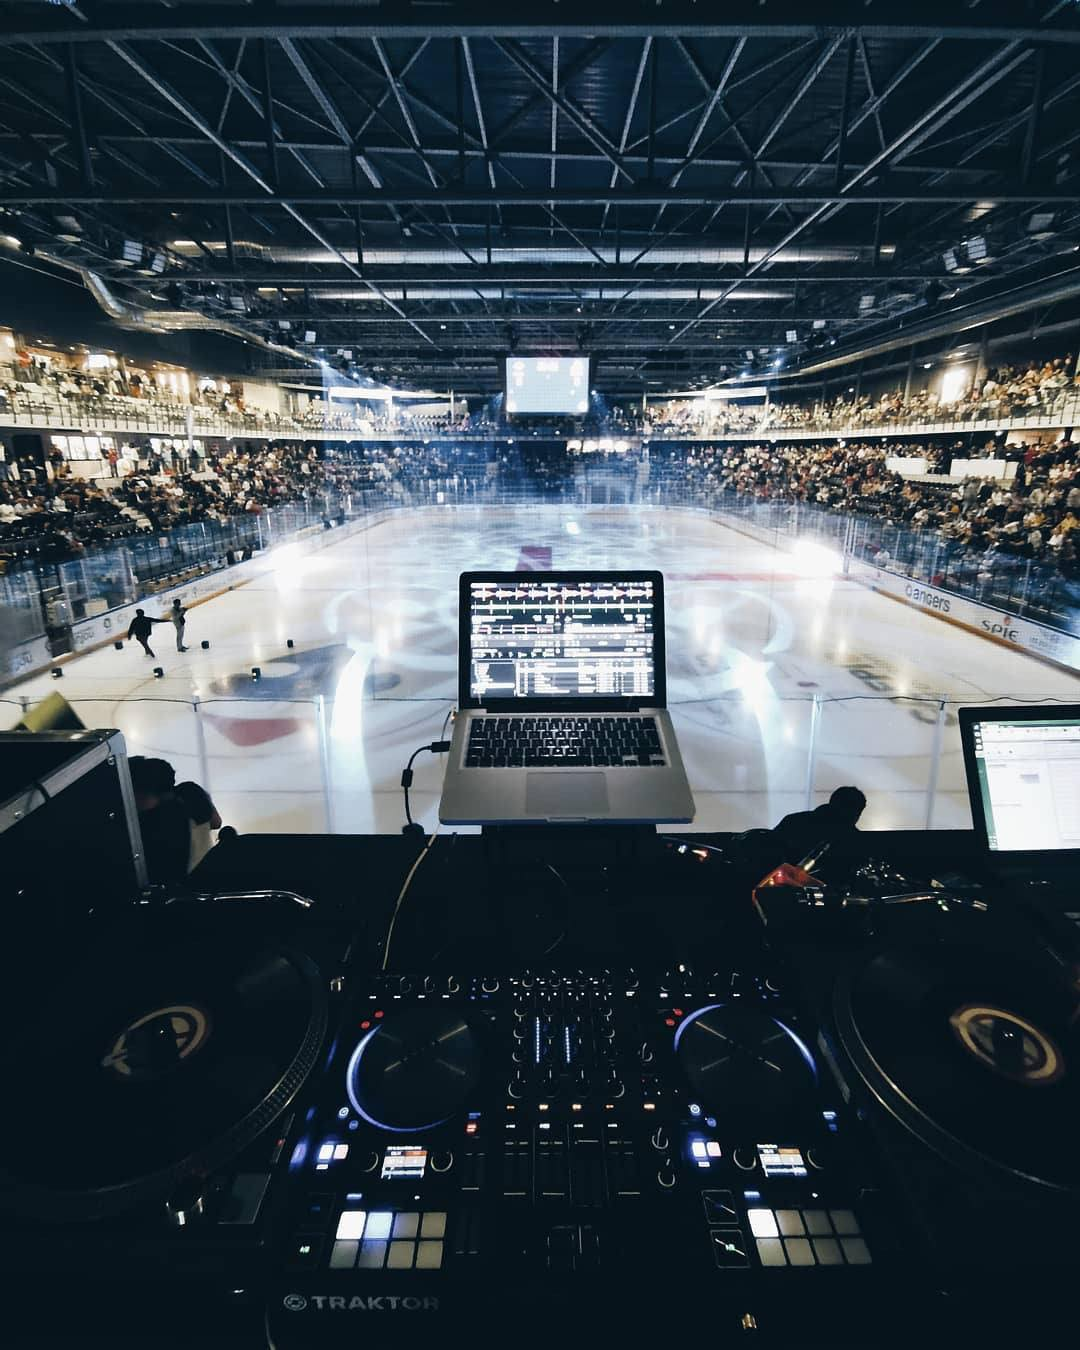 Hockey Rouen Calendrier.Slm Vs Rouen L Envol Des Ducs Les Ducs D Angers